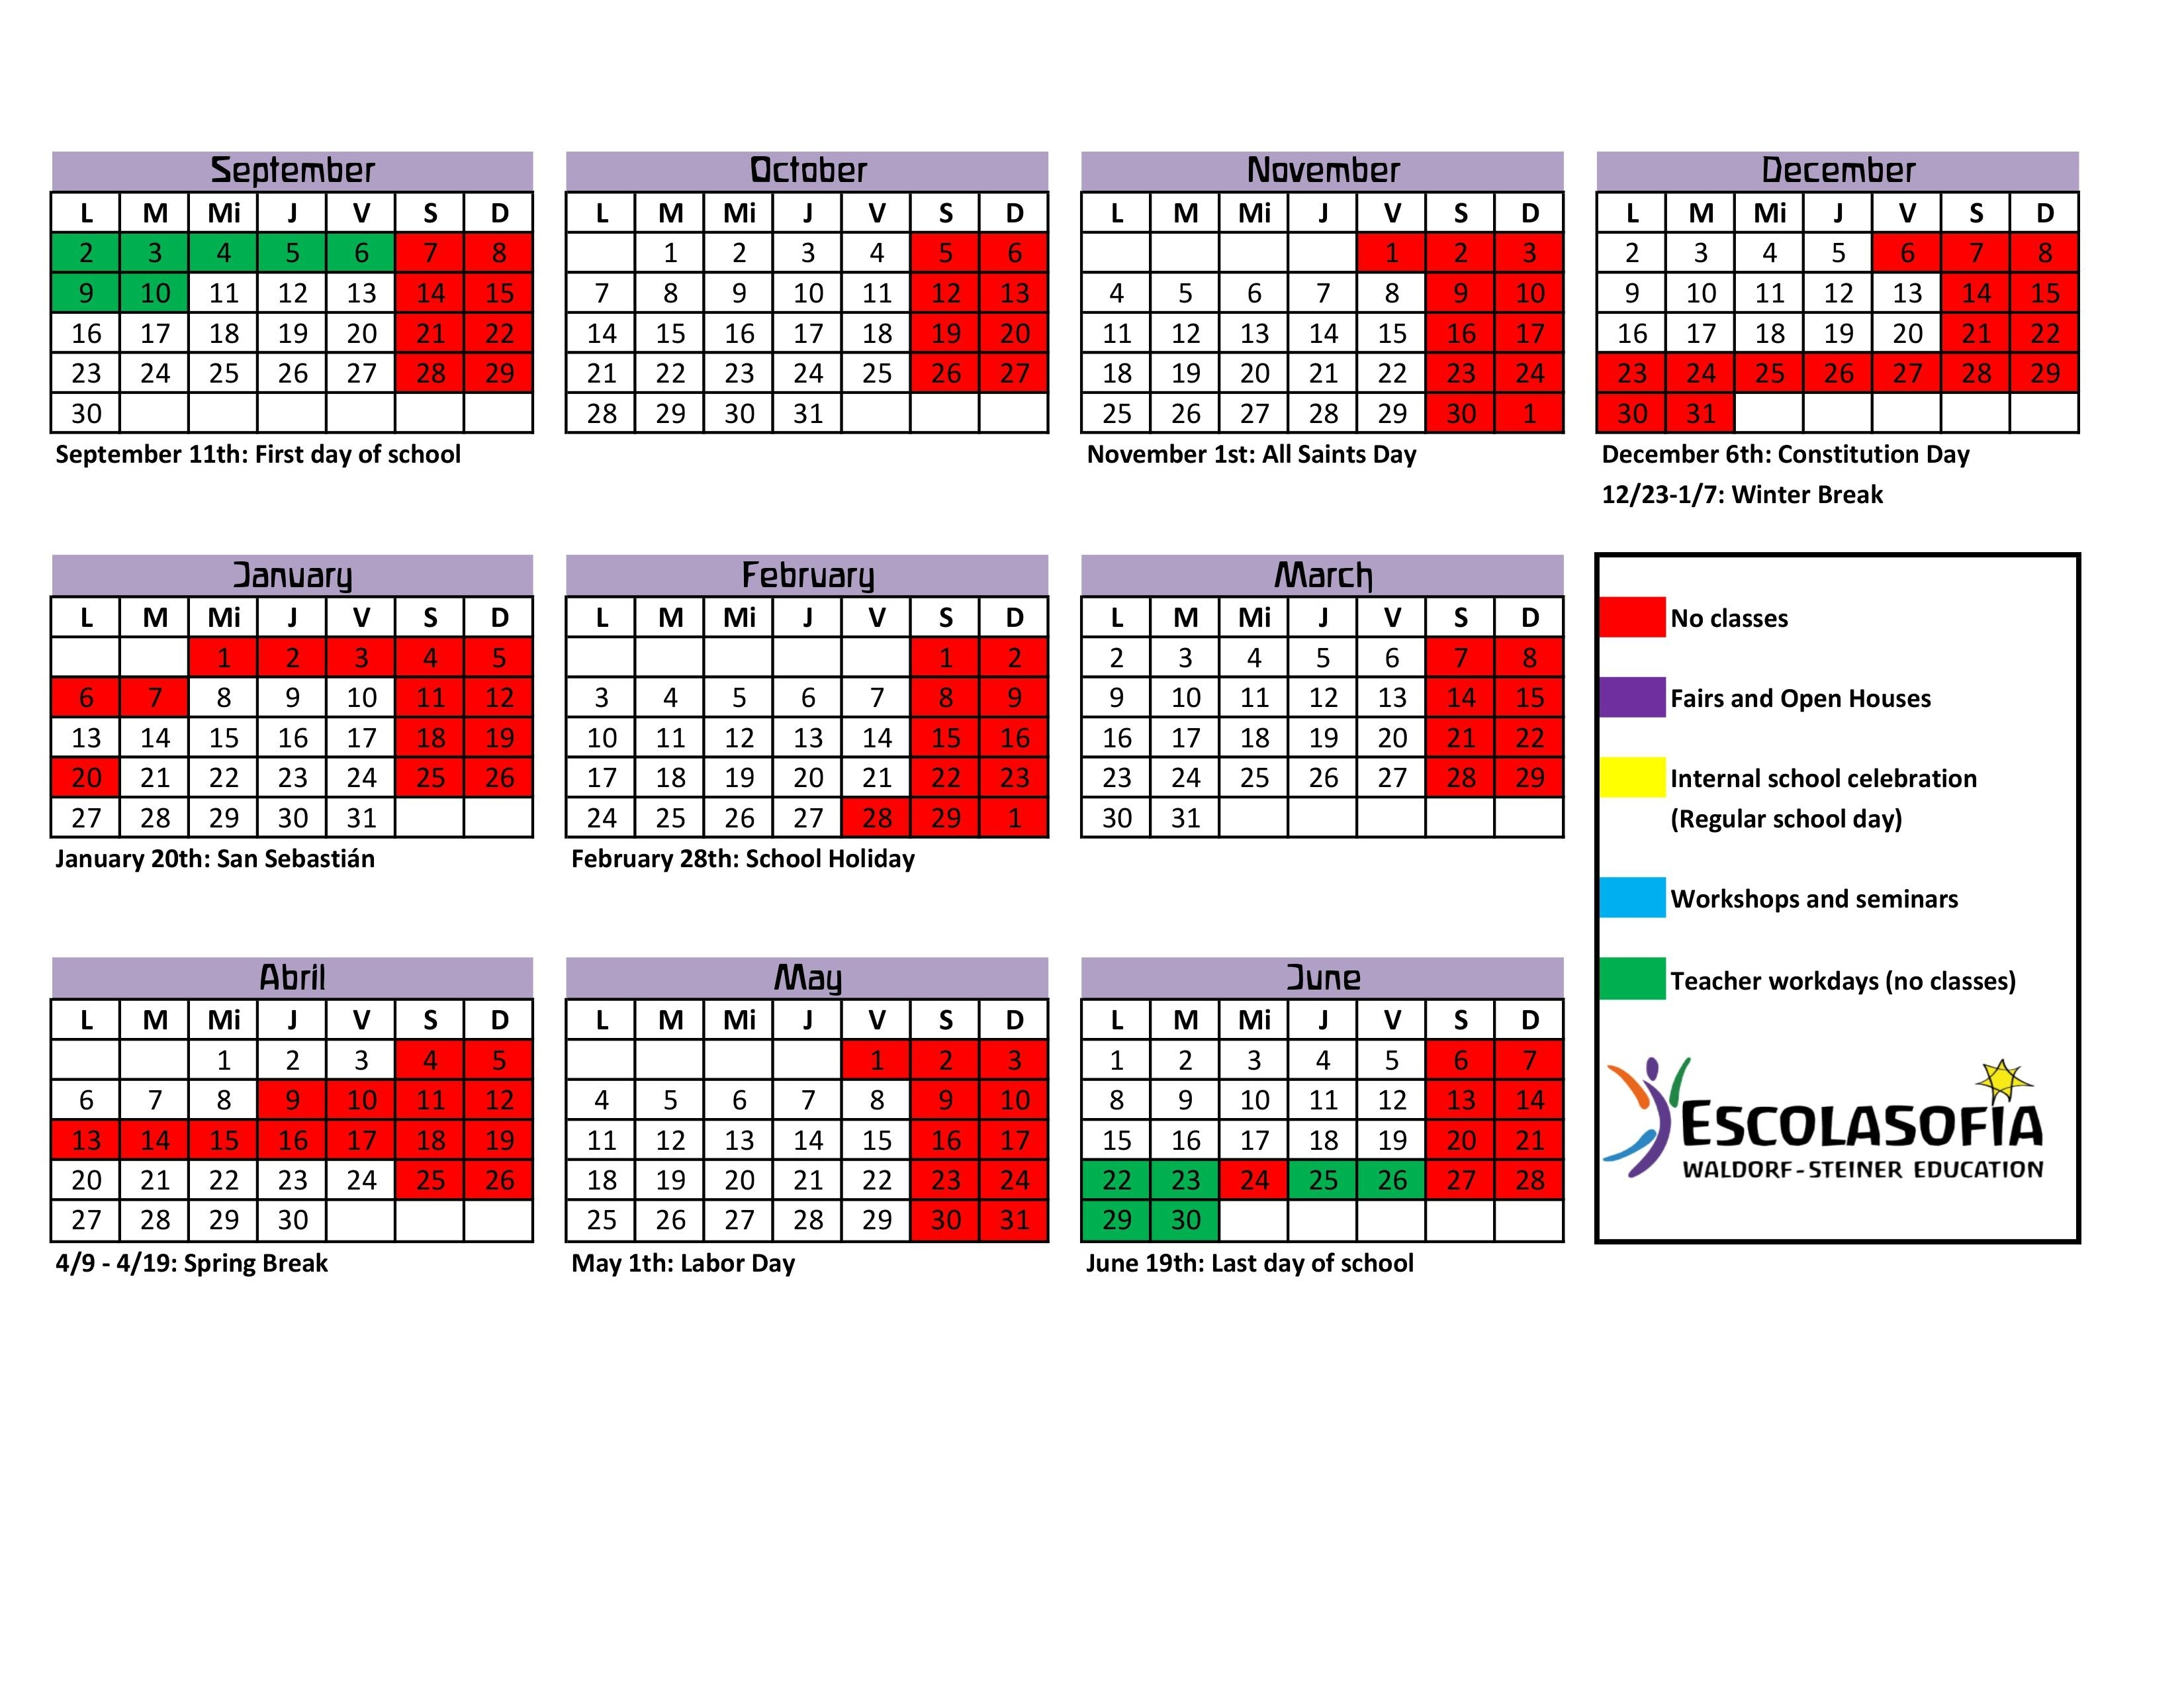 Escolasofia School Calendar 2019-20 - Waldorf Palma_St J School Calendar